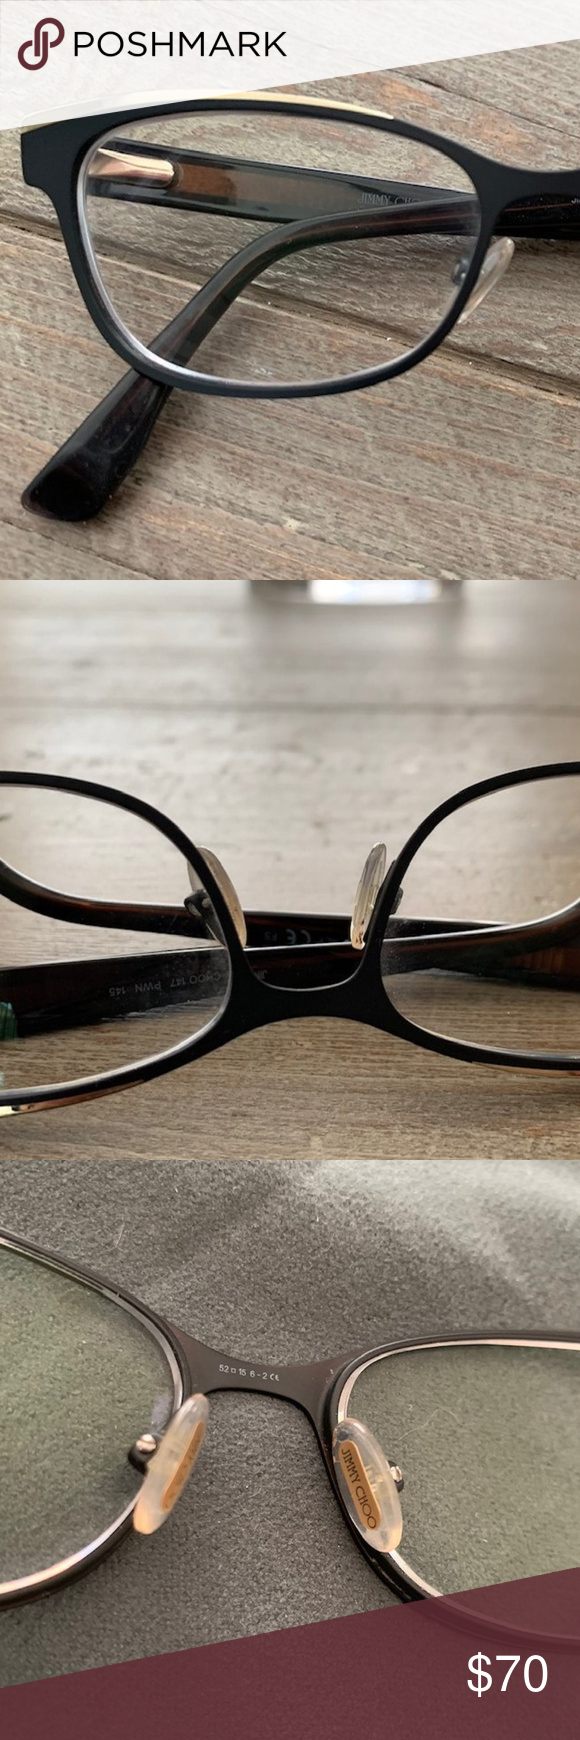 9c3bdfabf0 Jimmy Choo 147 Light Brown Palladium Eyeglasses Jimmy Choo has always  remained true to its original